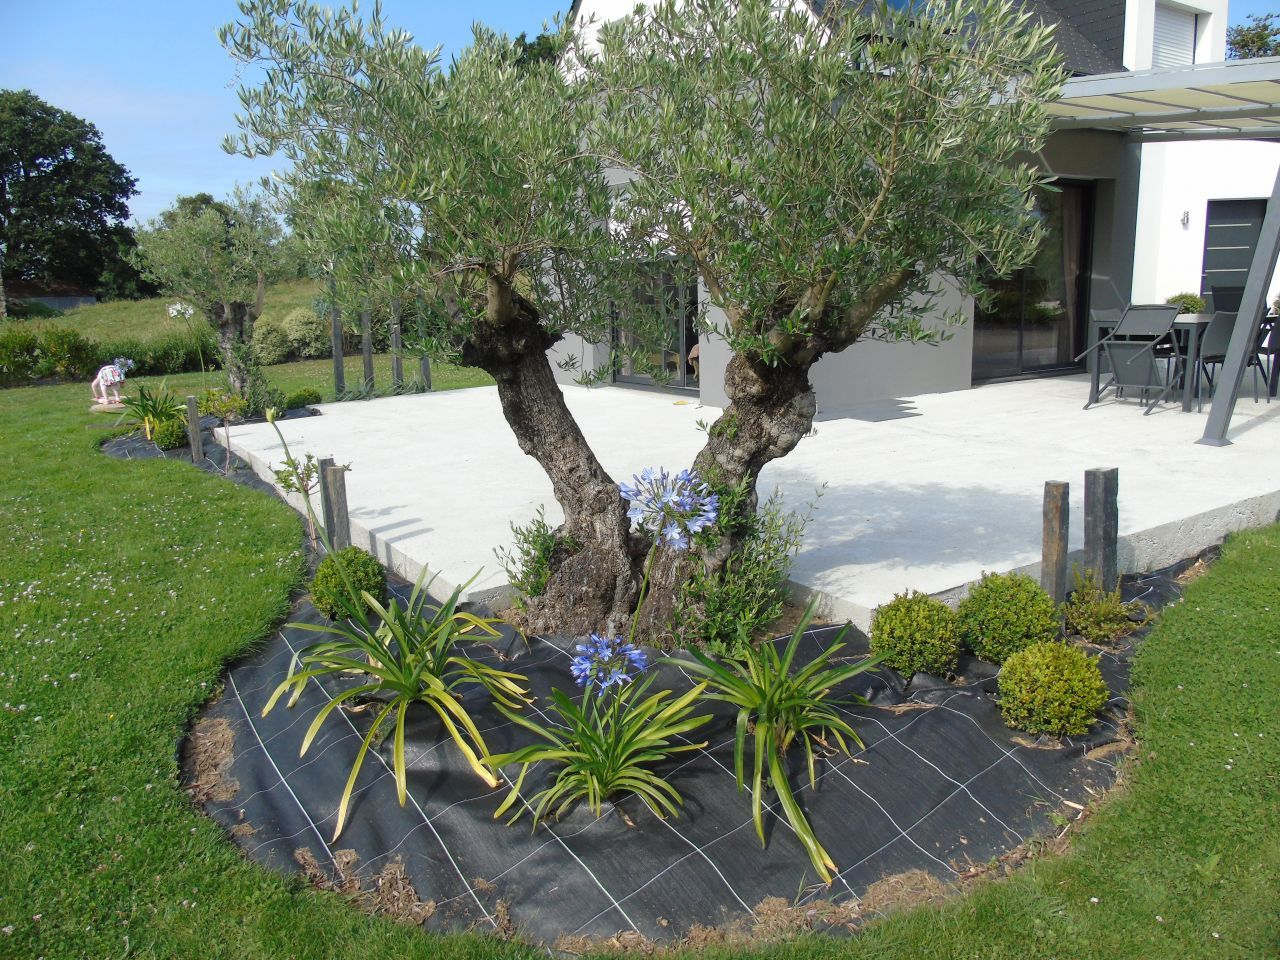 végétaux - plantation - haies][] olivier - angey (manche - 50